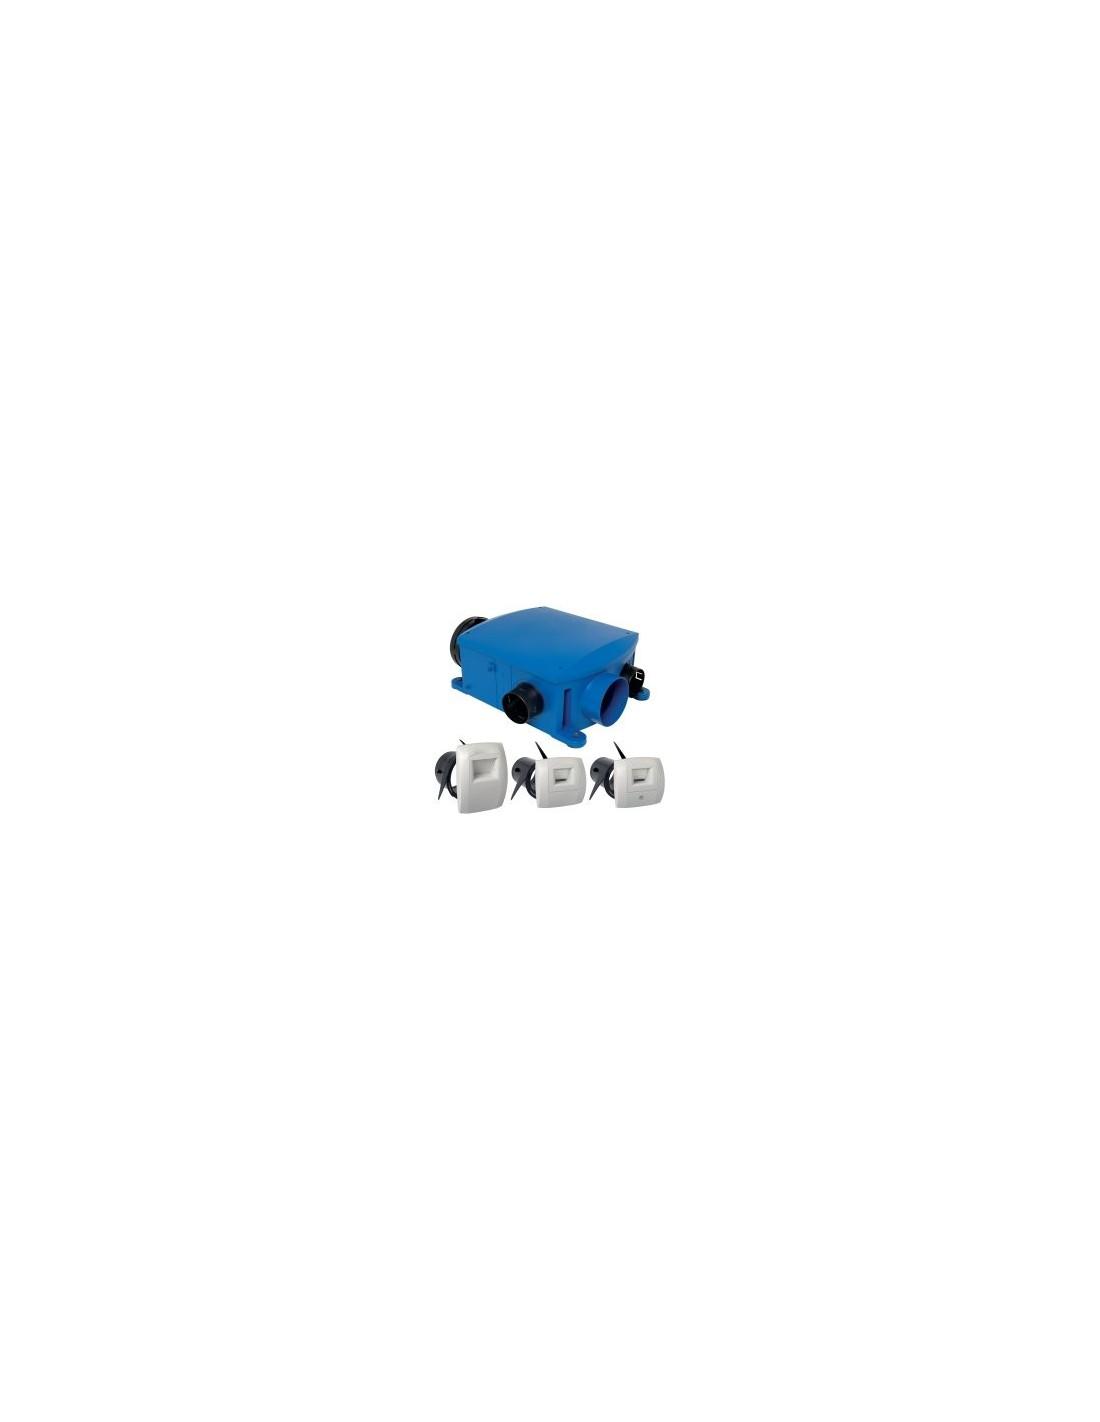 kit vmc hygror glable compact bahia t3 hygrob aldes ebay. Black Bedroom Furniture Sets. Home Design Ideas